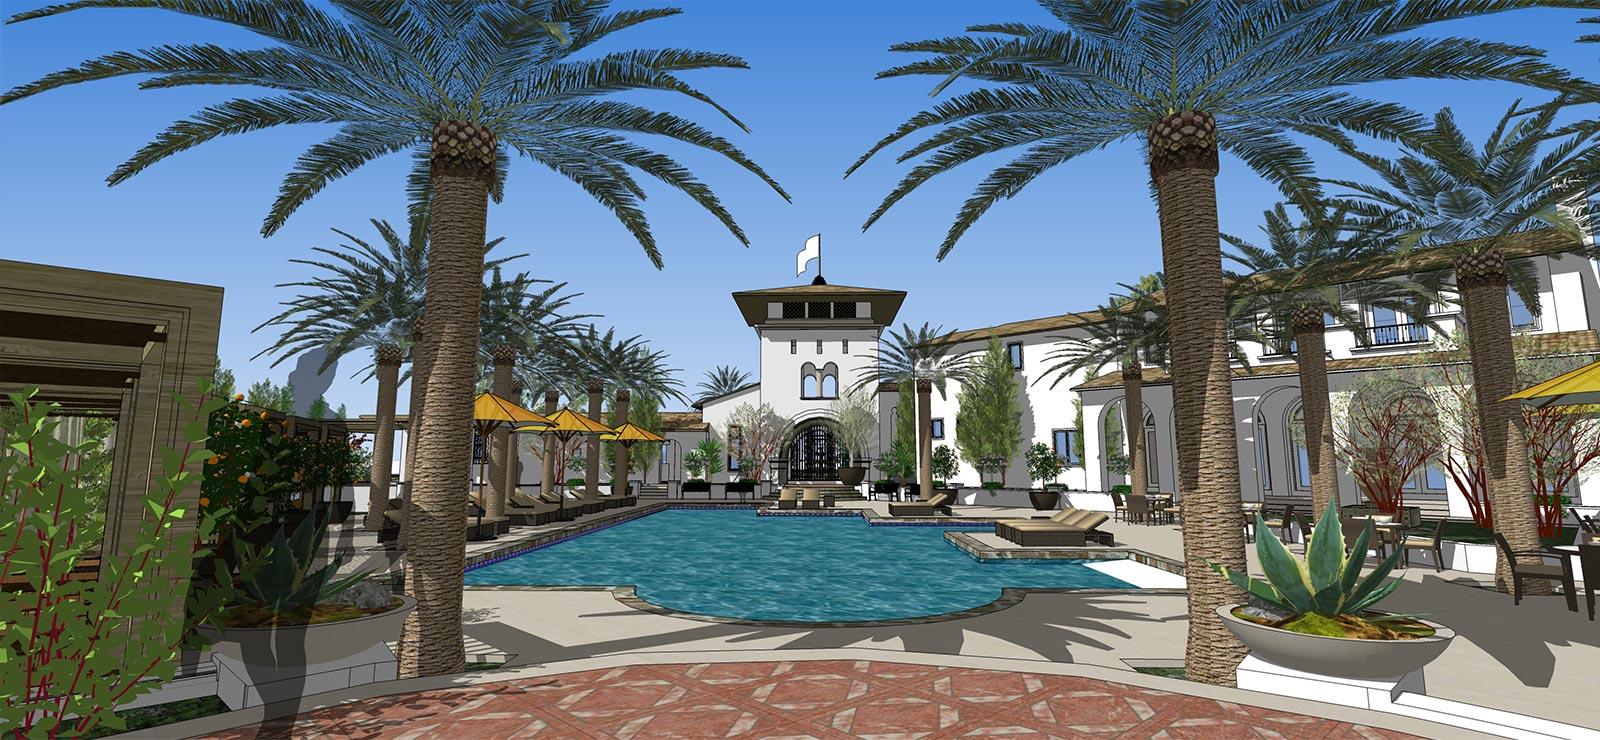 Montecito-Village-Design-1.jpg